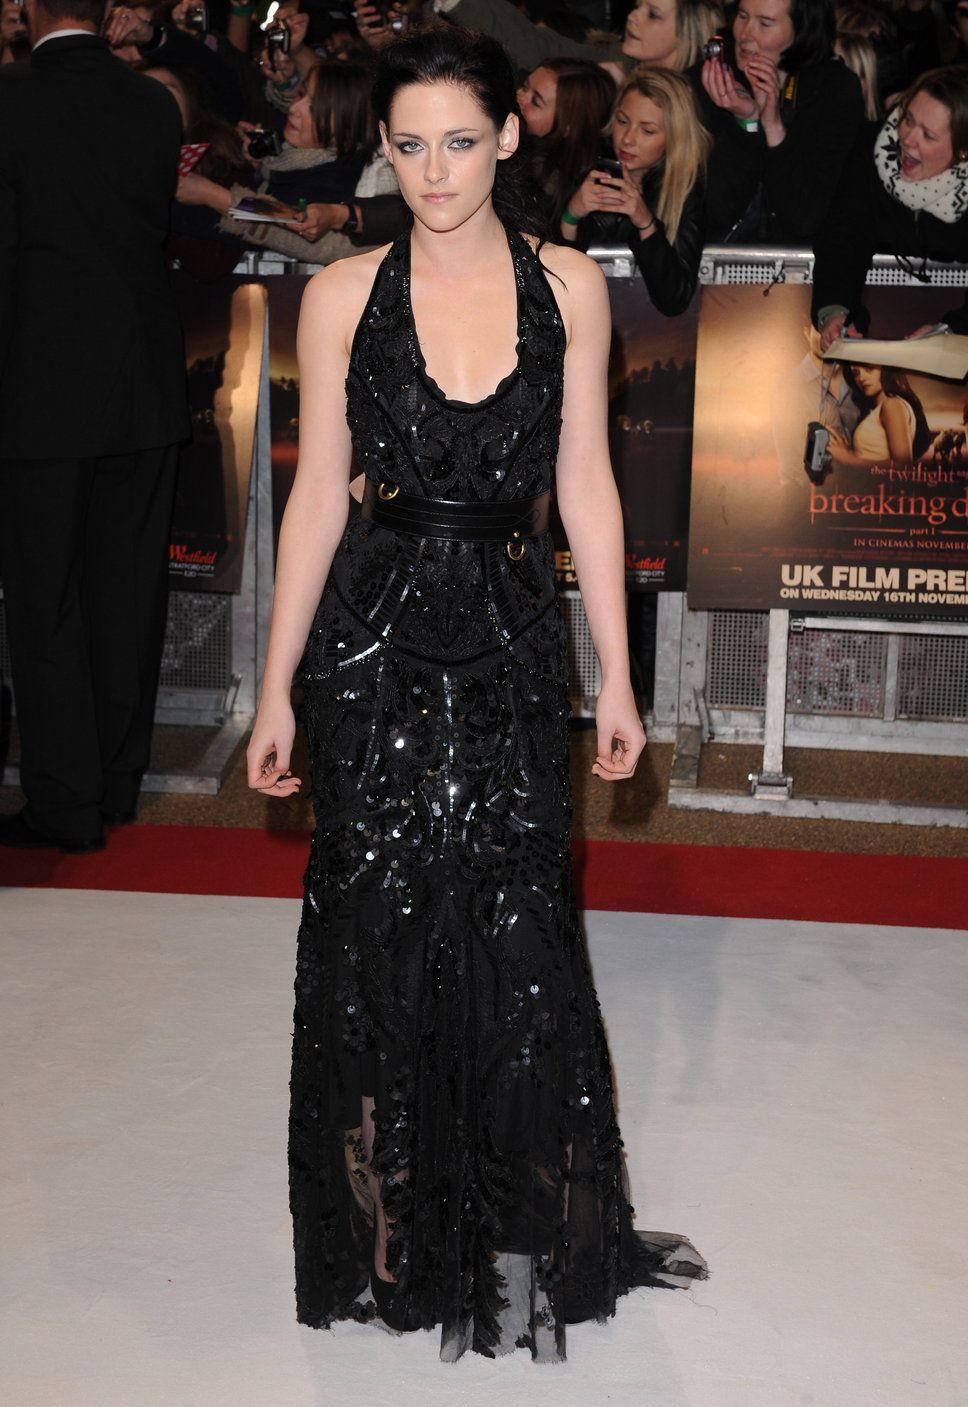 Kristen Stewart Dressing Kristen Stewart Black Glitter Dress Hair Do Twilight Premiere Photo Fashion Design Dress Dresses Formal Dresses Long [ 1407 x 968 Pixel ]